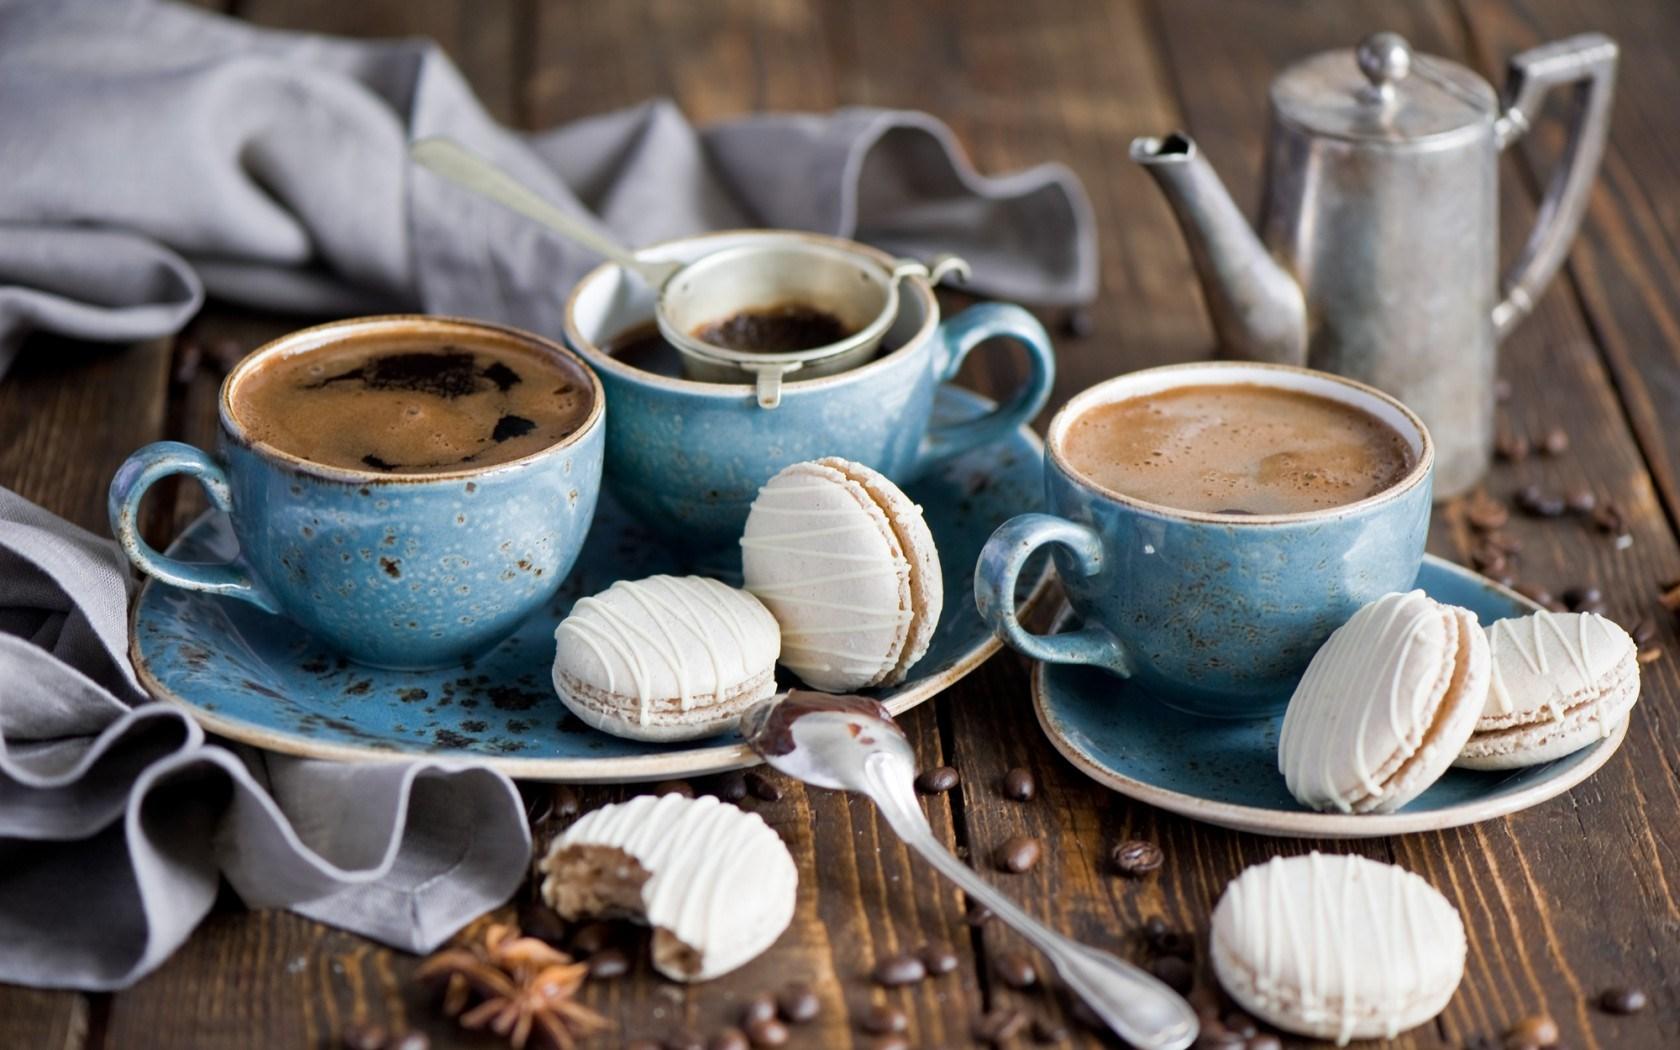 Coffee Drink Cup Cookies Macaron Macaroon